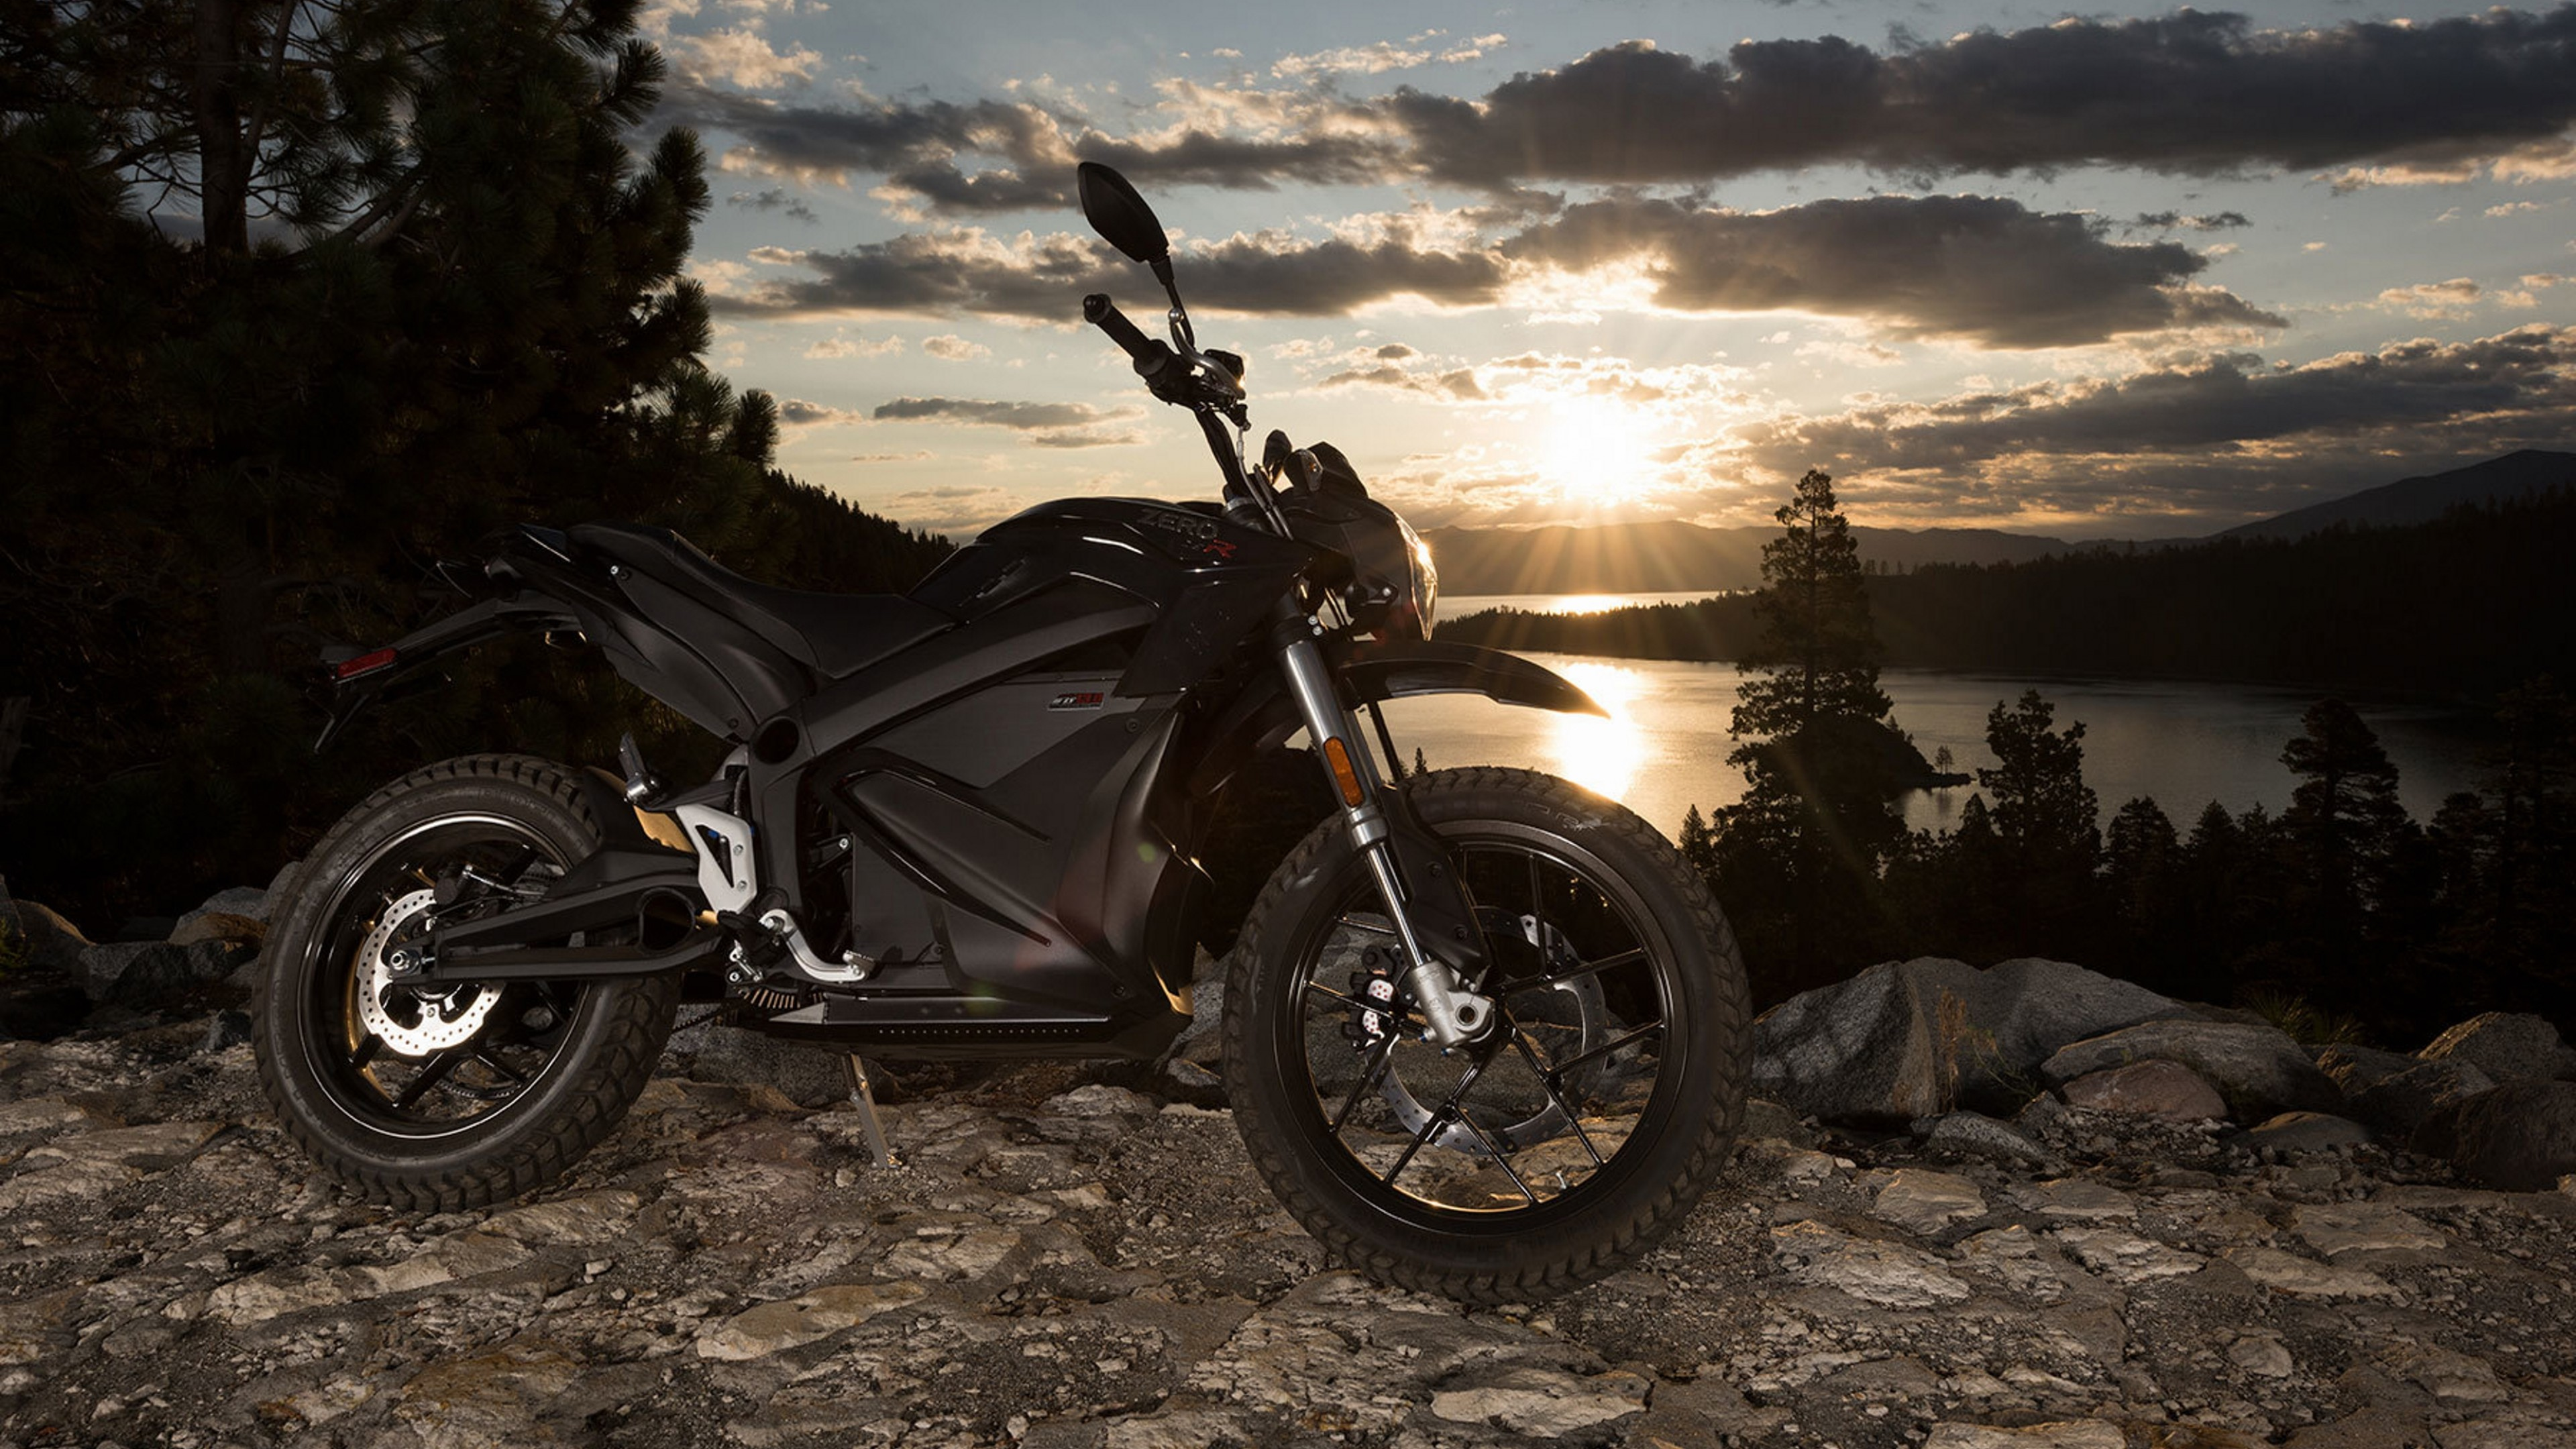 Fondos de pantalla Moto Zero DSR 2016